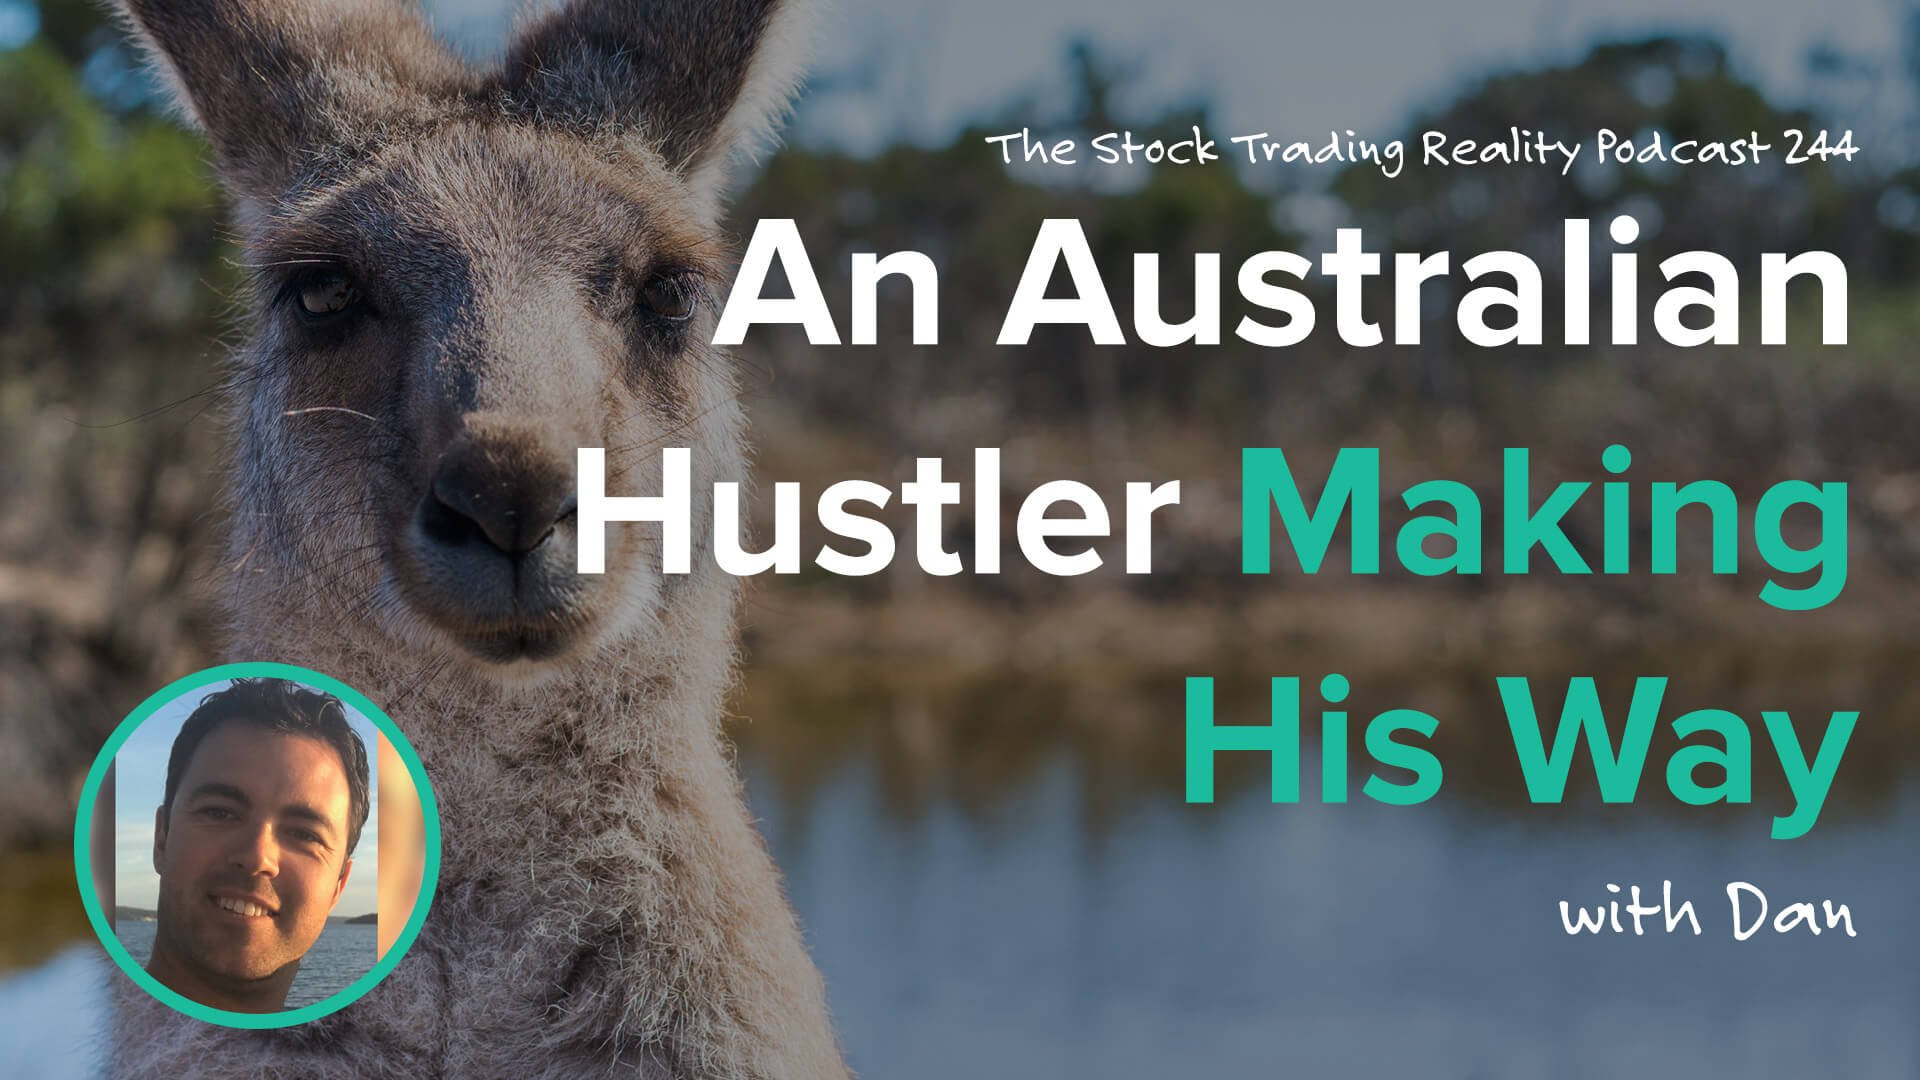 An Australian Hustler Making His Way